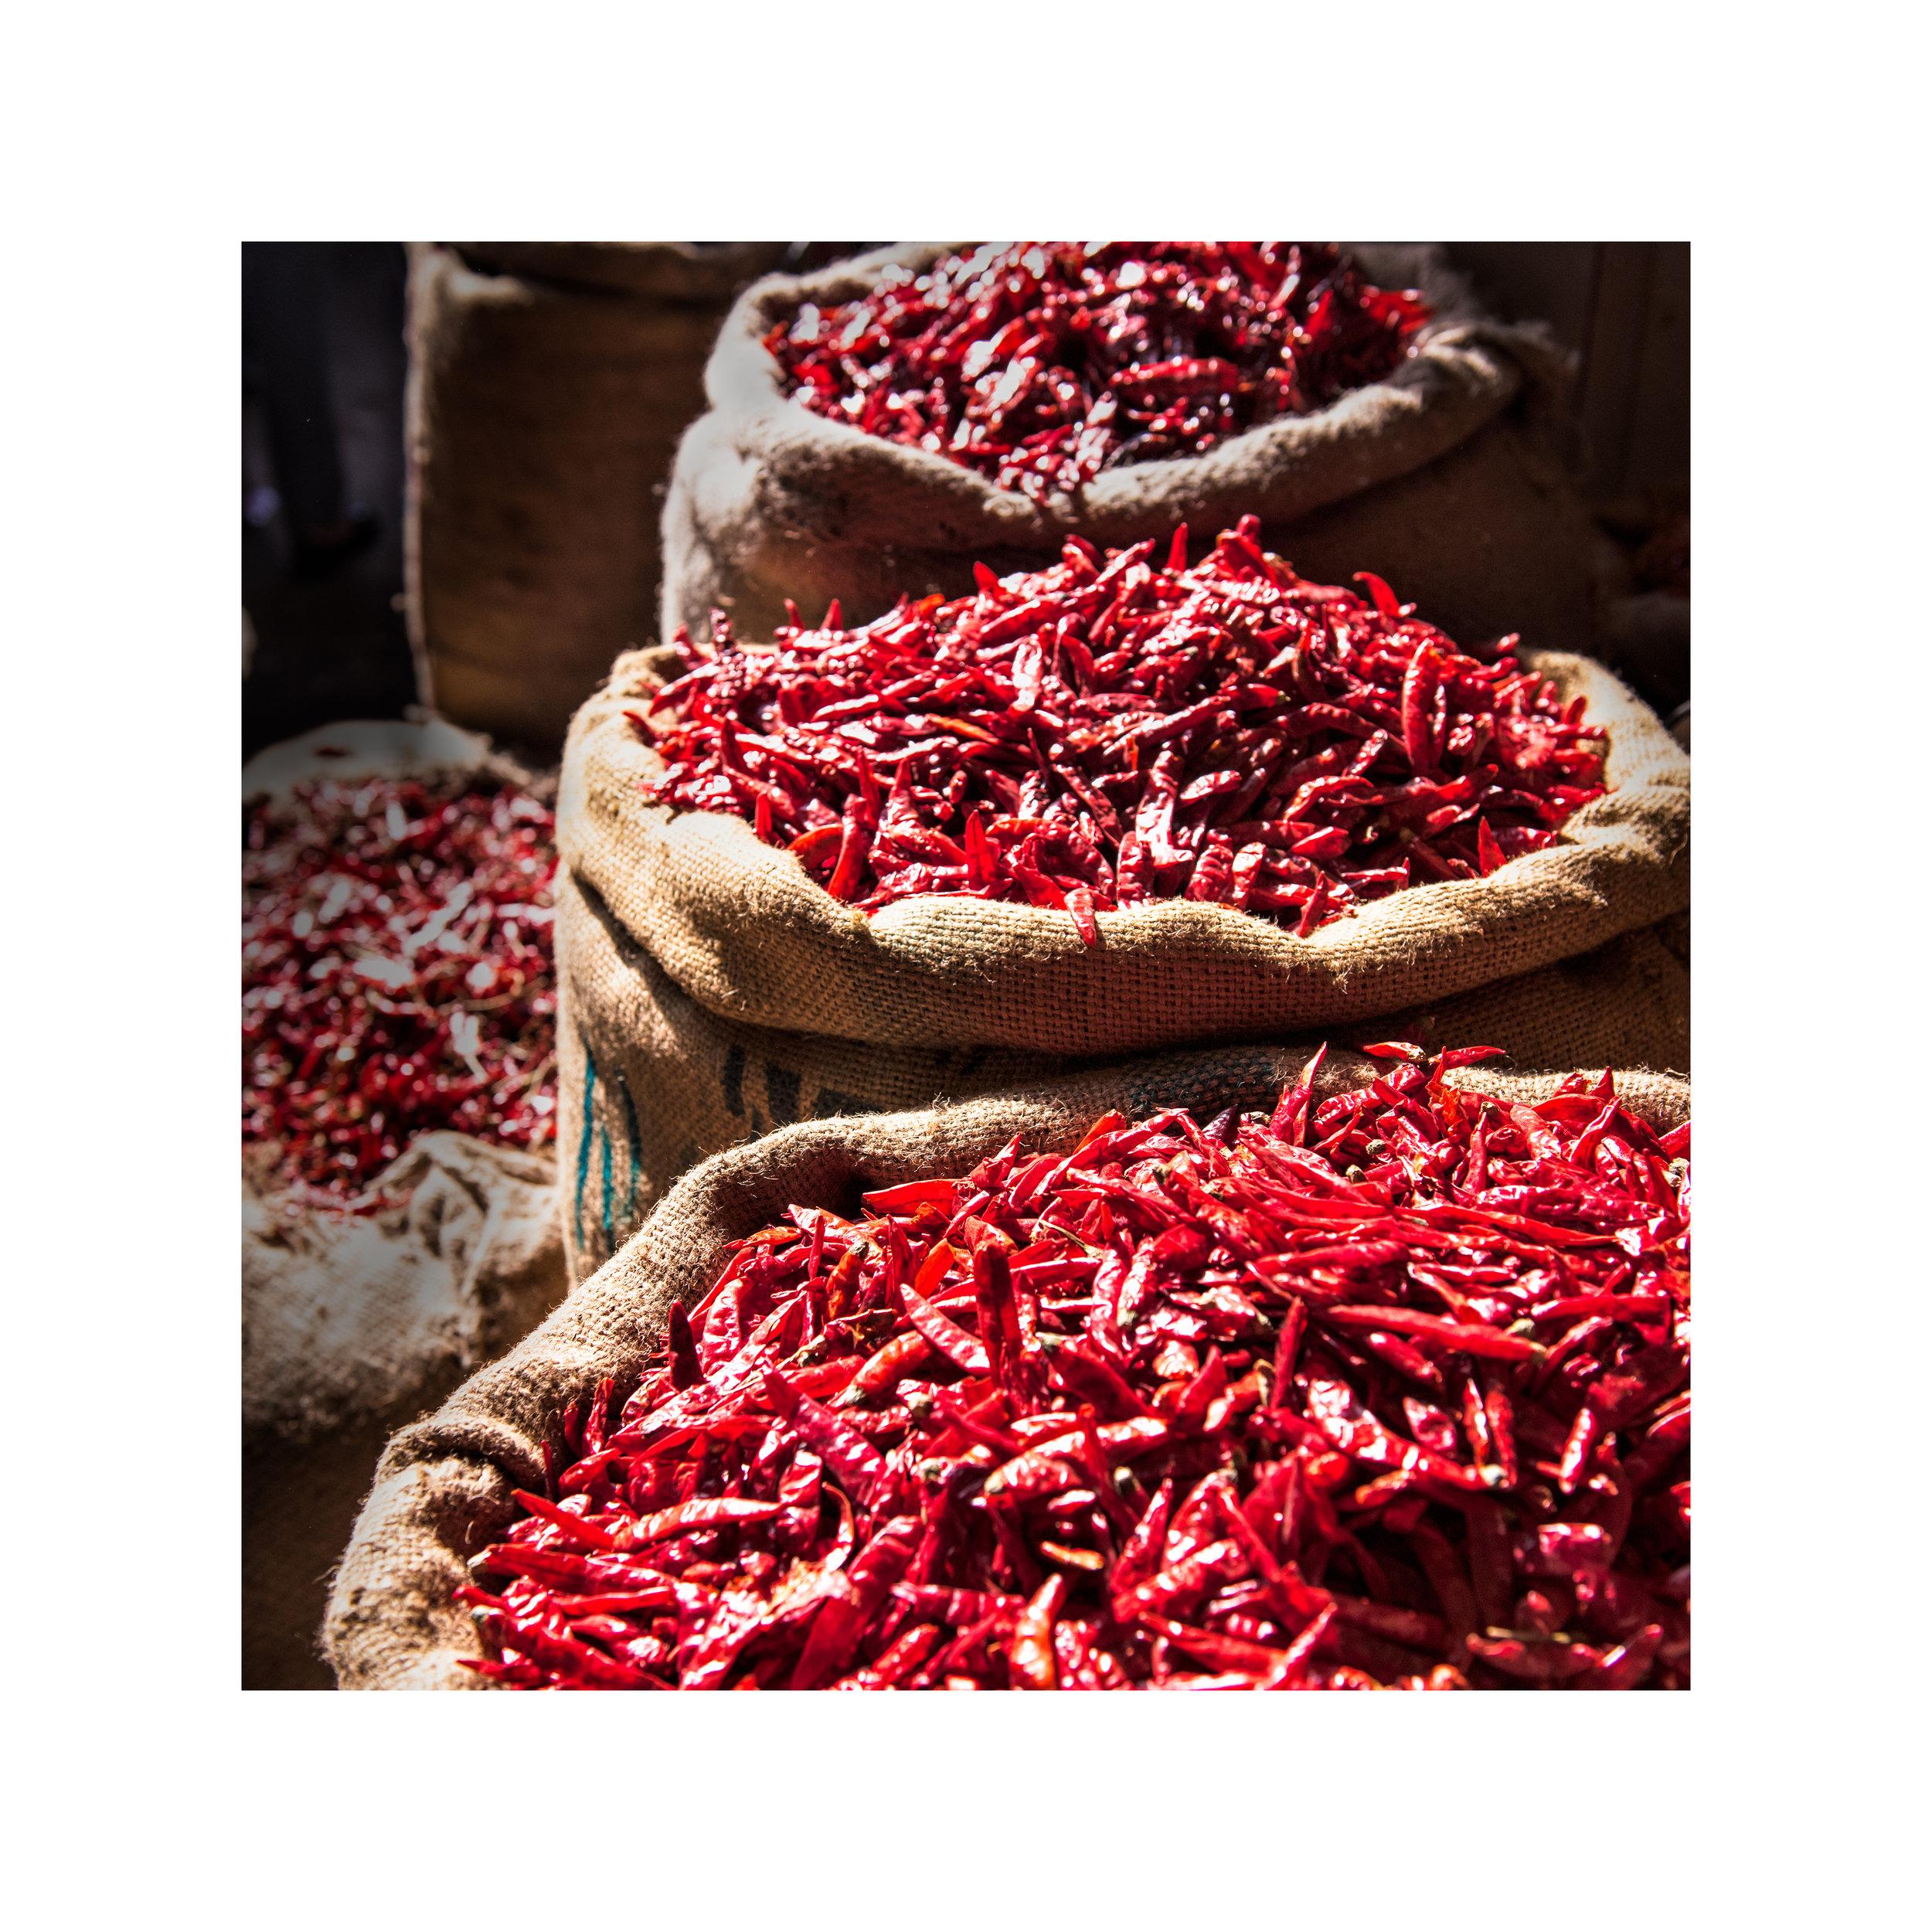 161225 Indian Food Fair for fineartpaper_©k.maestudio_©kayakosareen-4.jpg